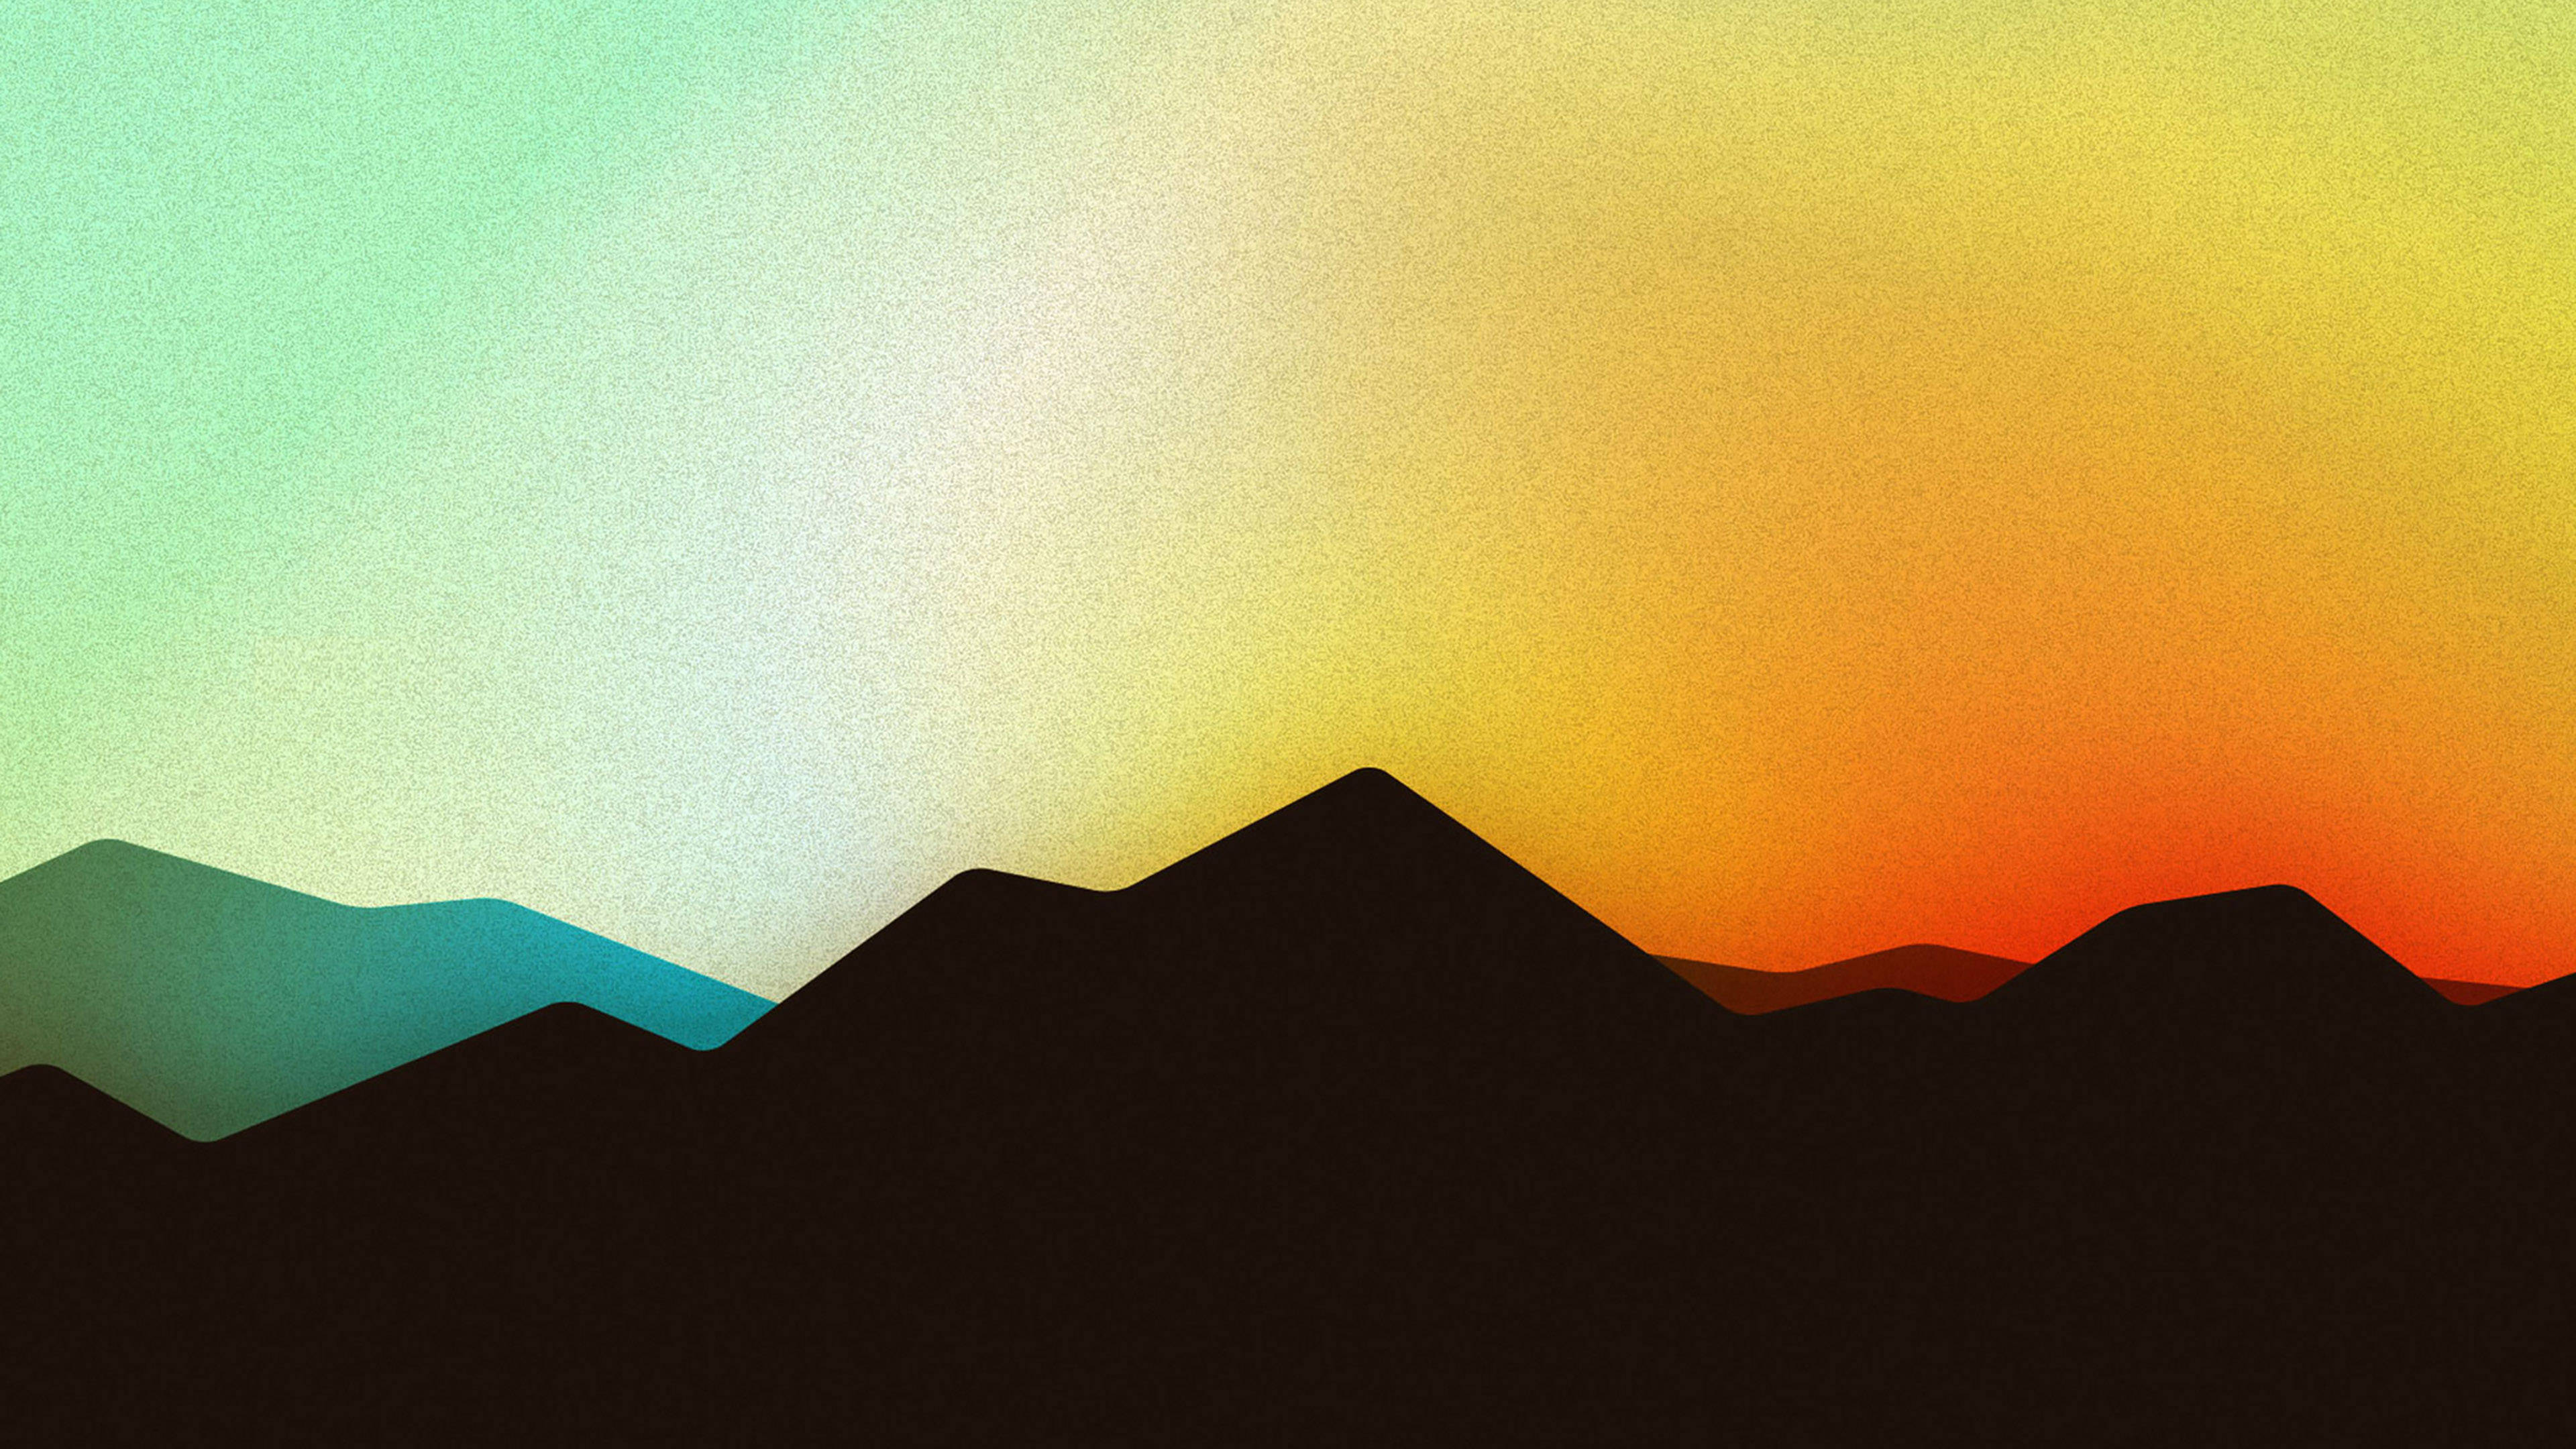 ab95-wallpaper-explore-id-mountain-wallpaper